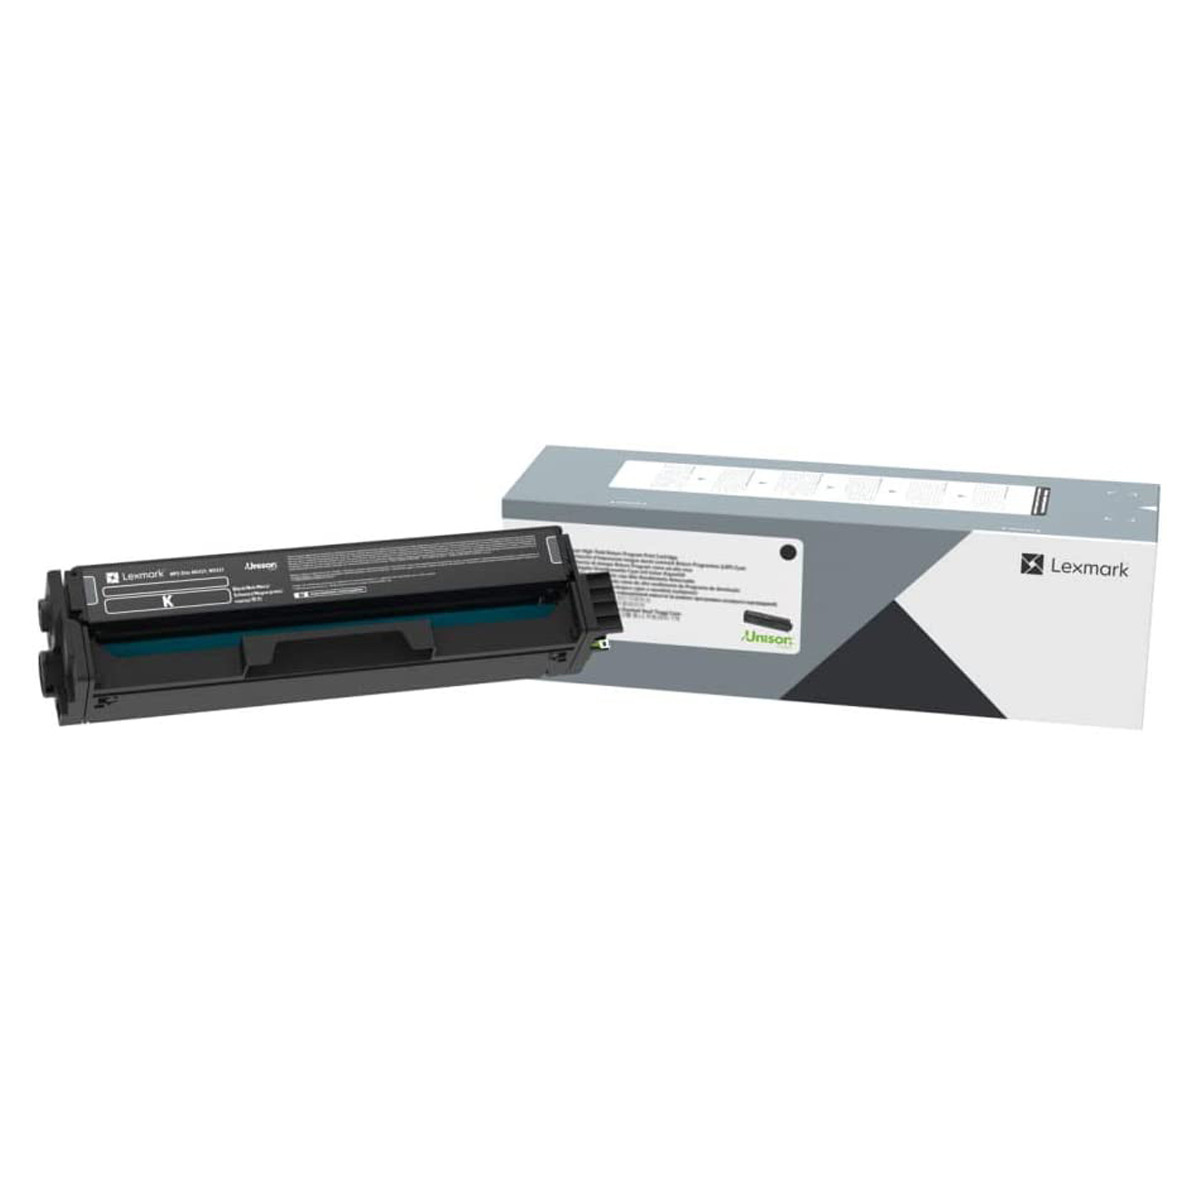 Toner Lexmark C320010 C3200 C3240K0 Preto   MC3224ADWE MC3224 C3224DW C3224   Original 1.5k